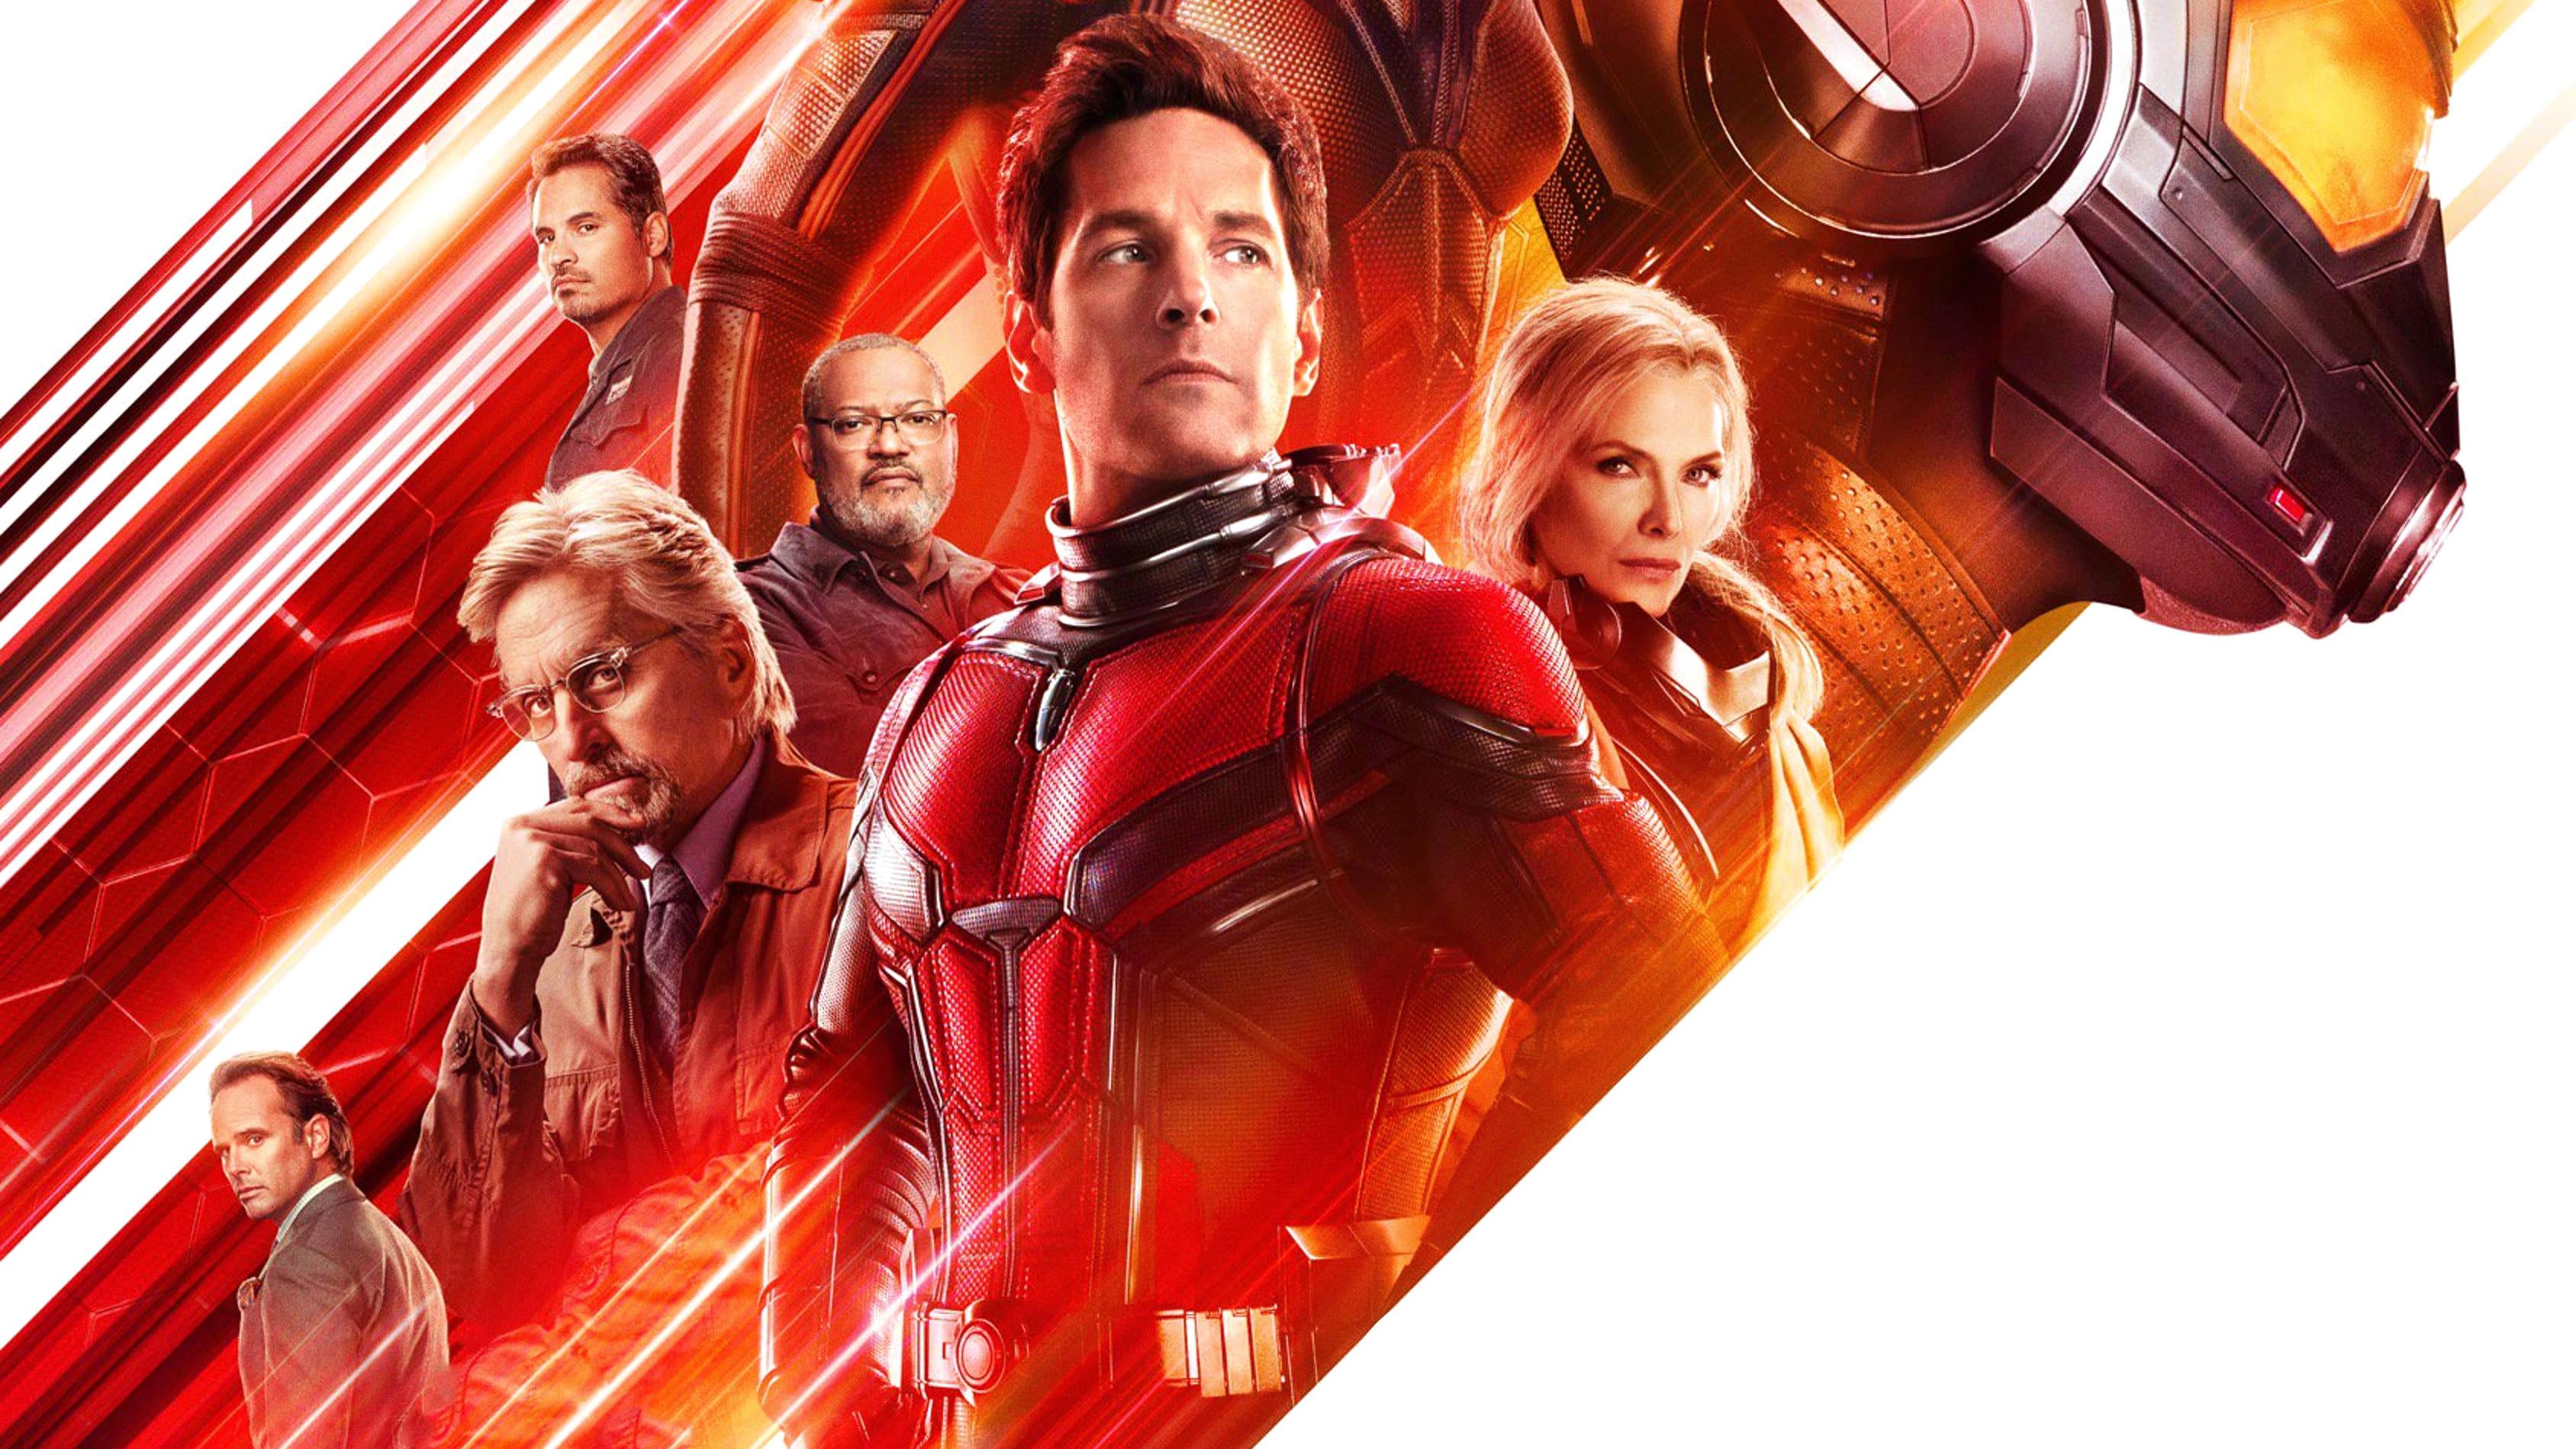 Ant-Man Movie4k.To